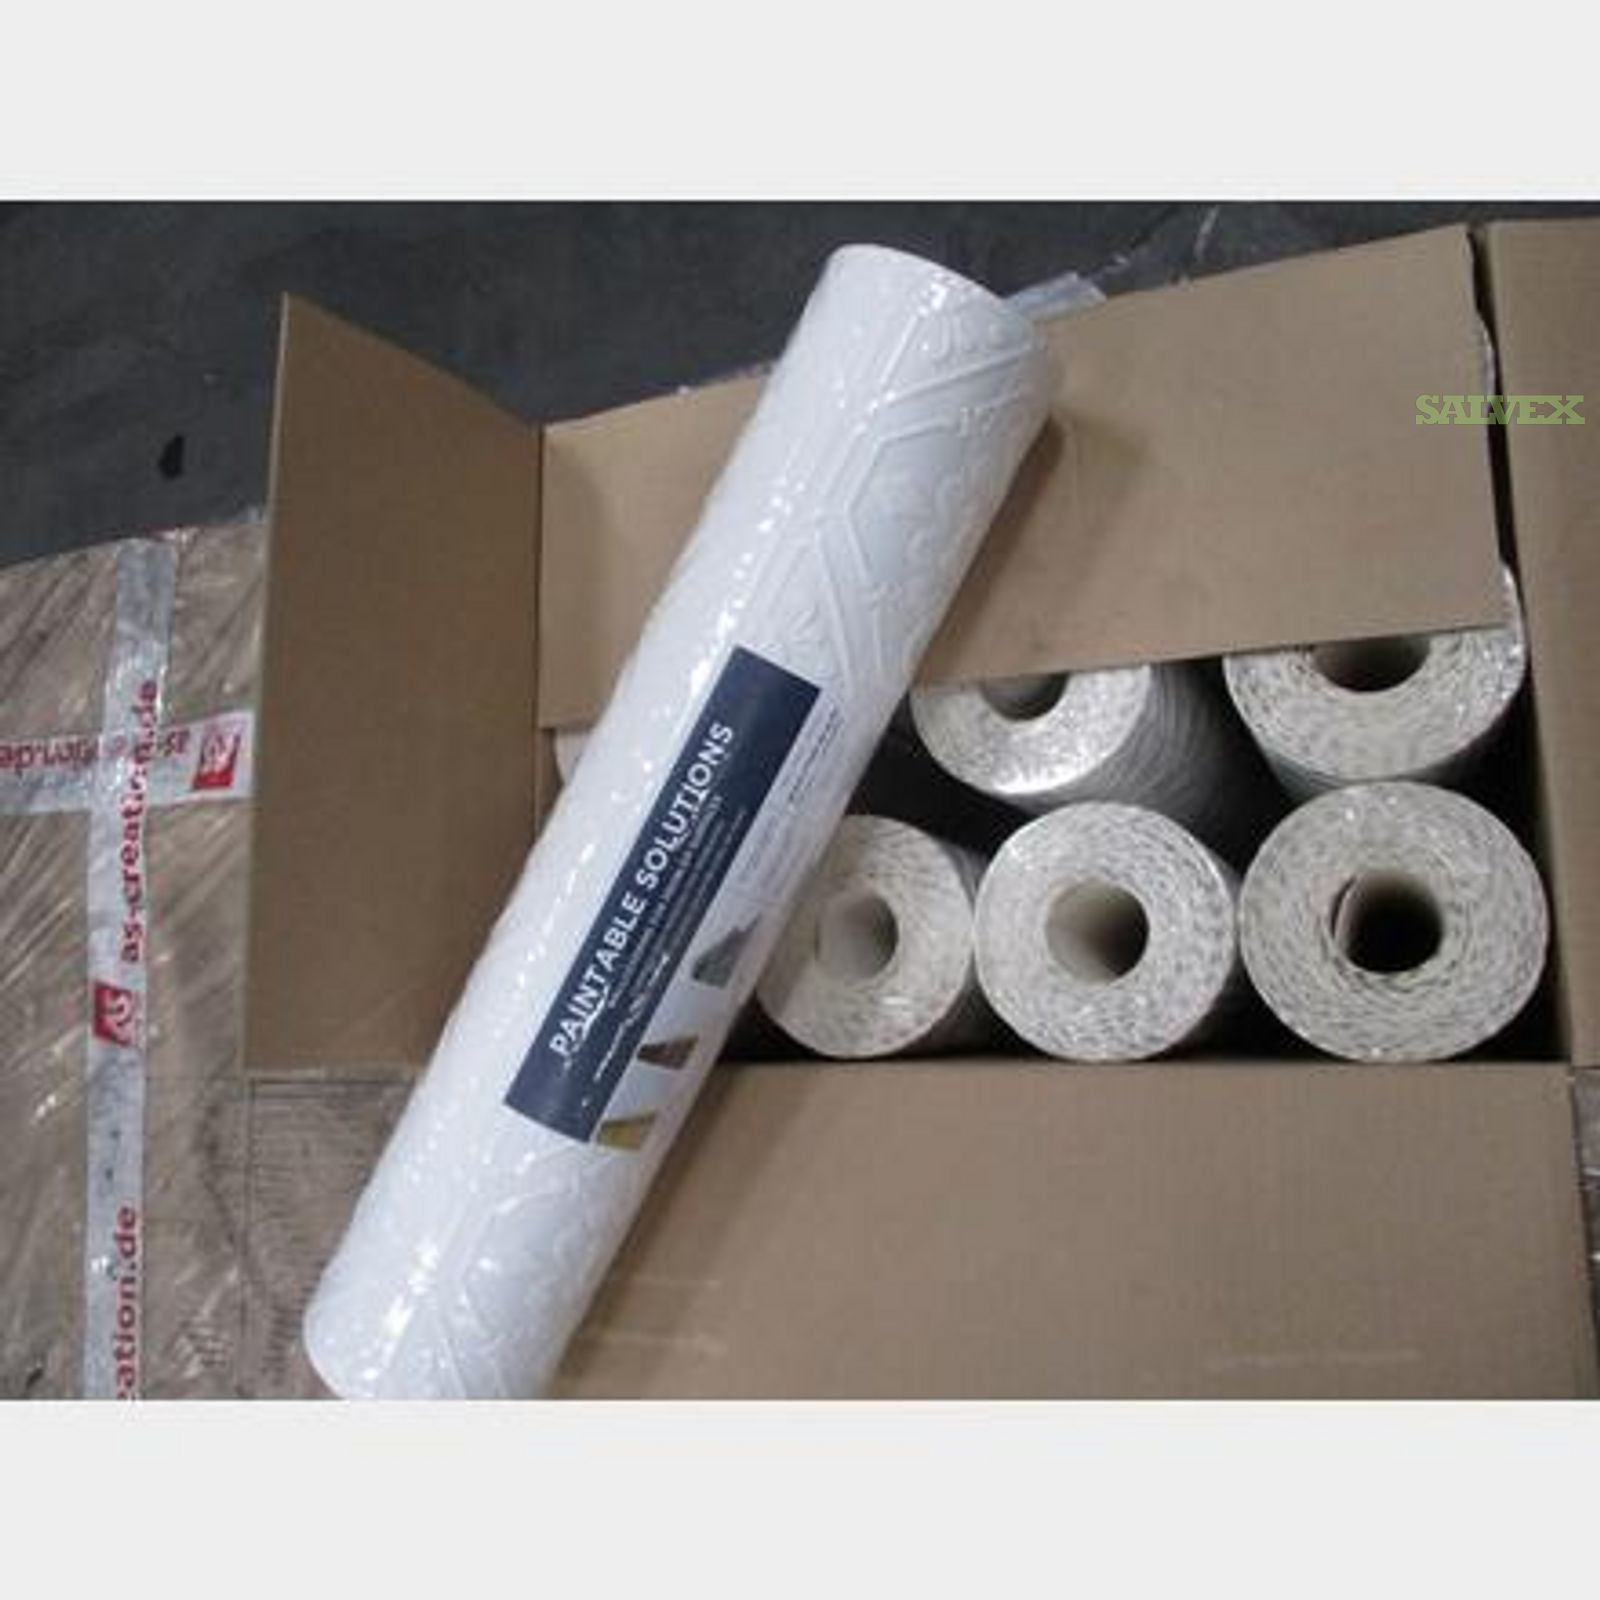 Wallpaper Rolls - 3D Paintable; Vinyl; Pre-Pasted; Washable (400 Rolls)